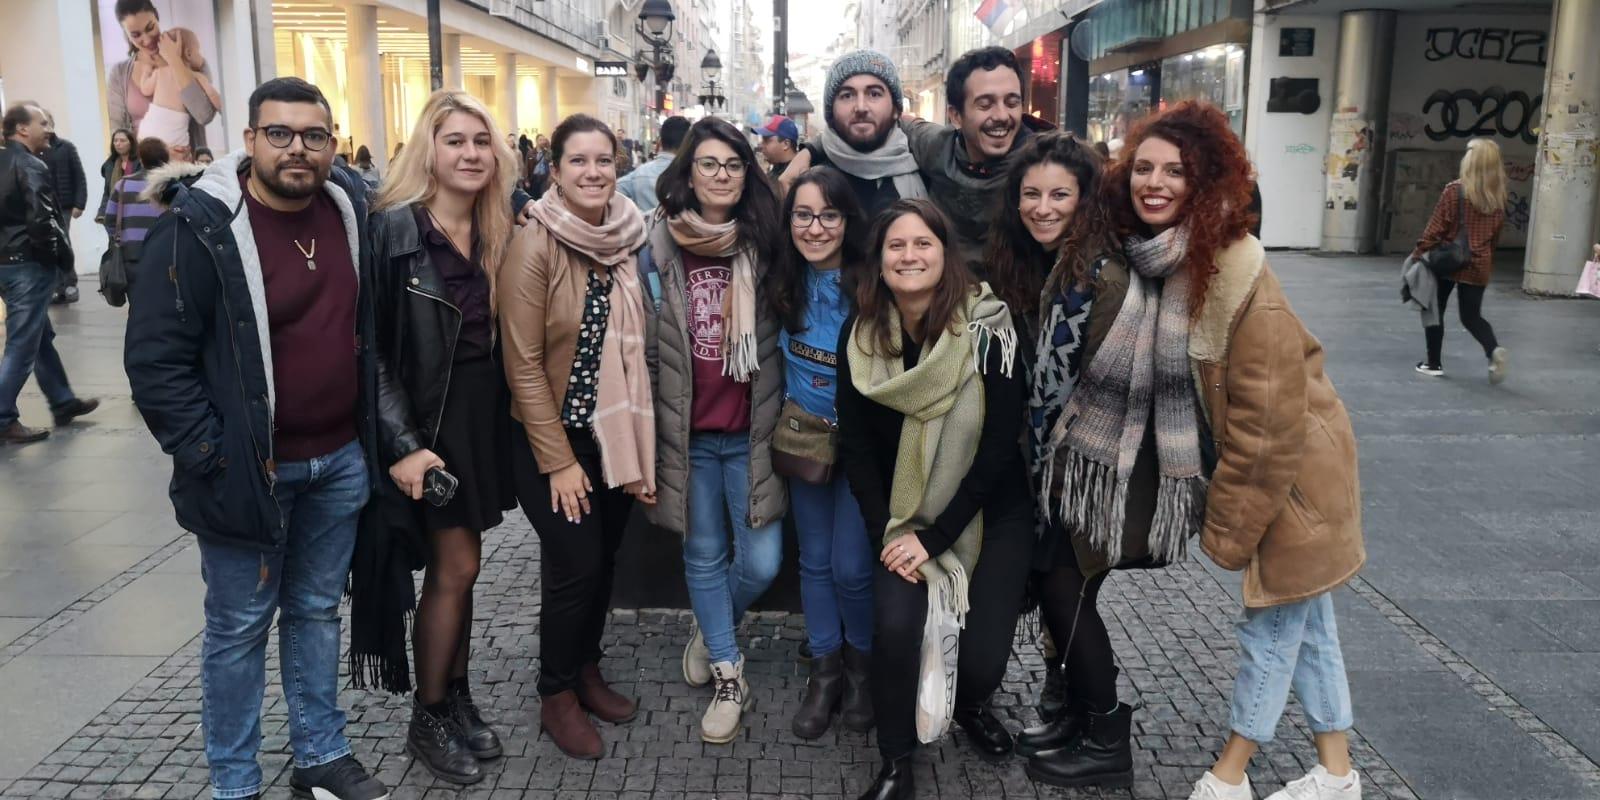 AMESCI_Serbia_gruppo_Corpi-Civili-di-Pace